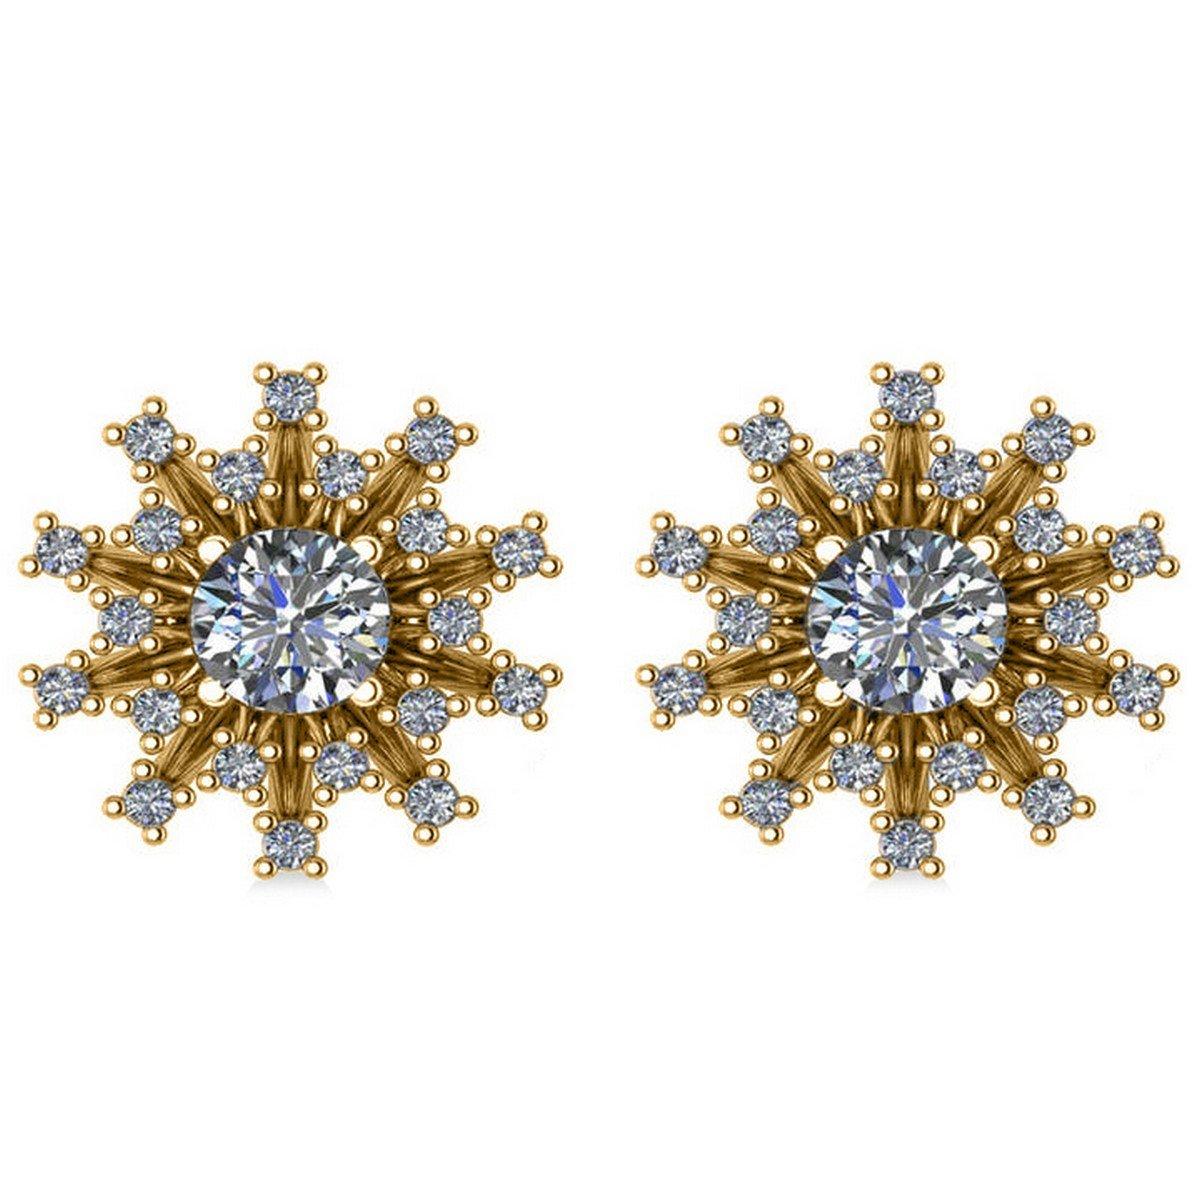 e3d41f2e1 Amazon.com: Diamond Sunburst Earrings 14k Yellow Gold (1.40ct): Jewelry